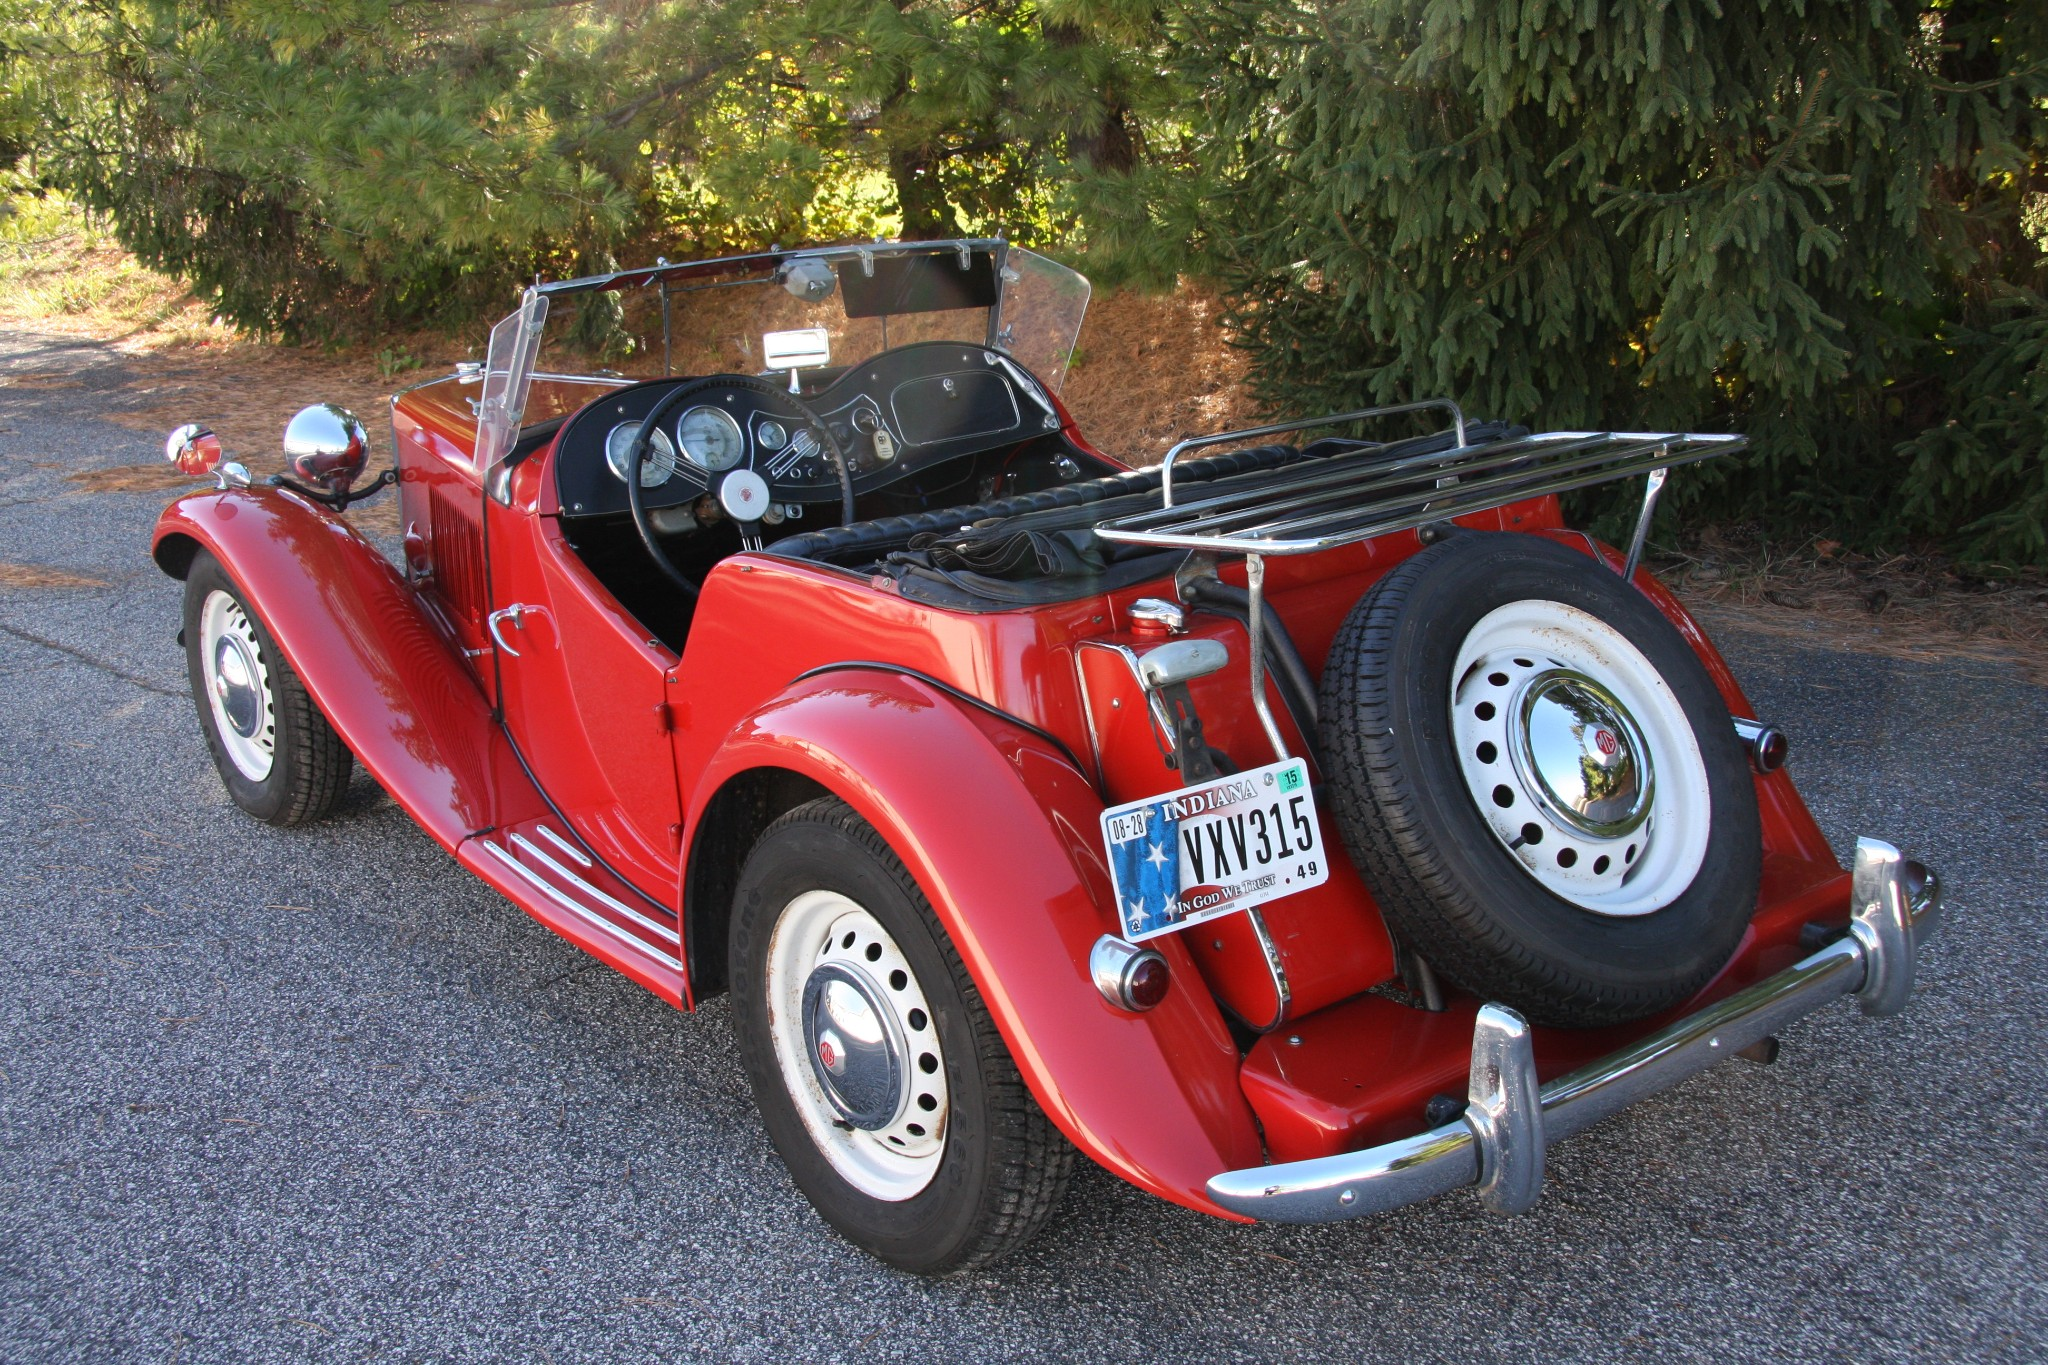 1953 MG TD-1